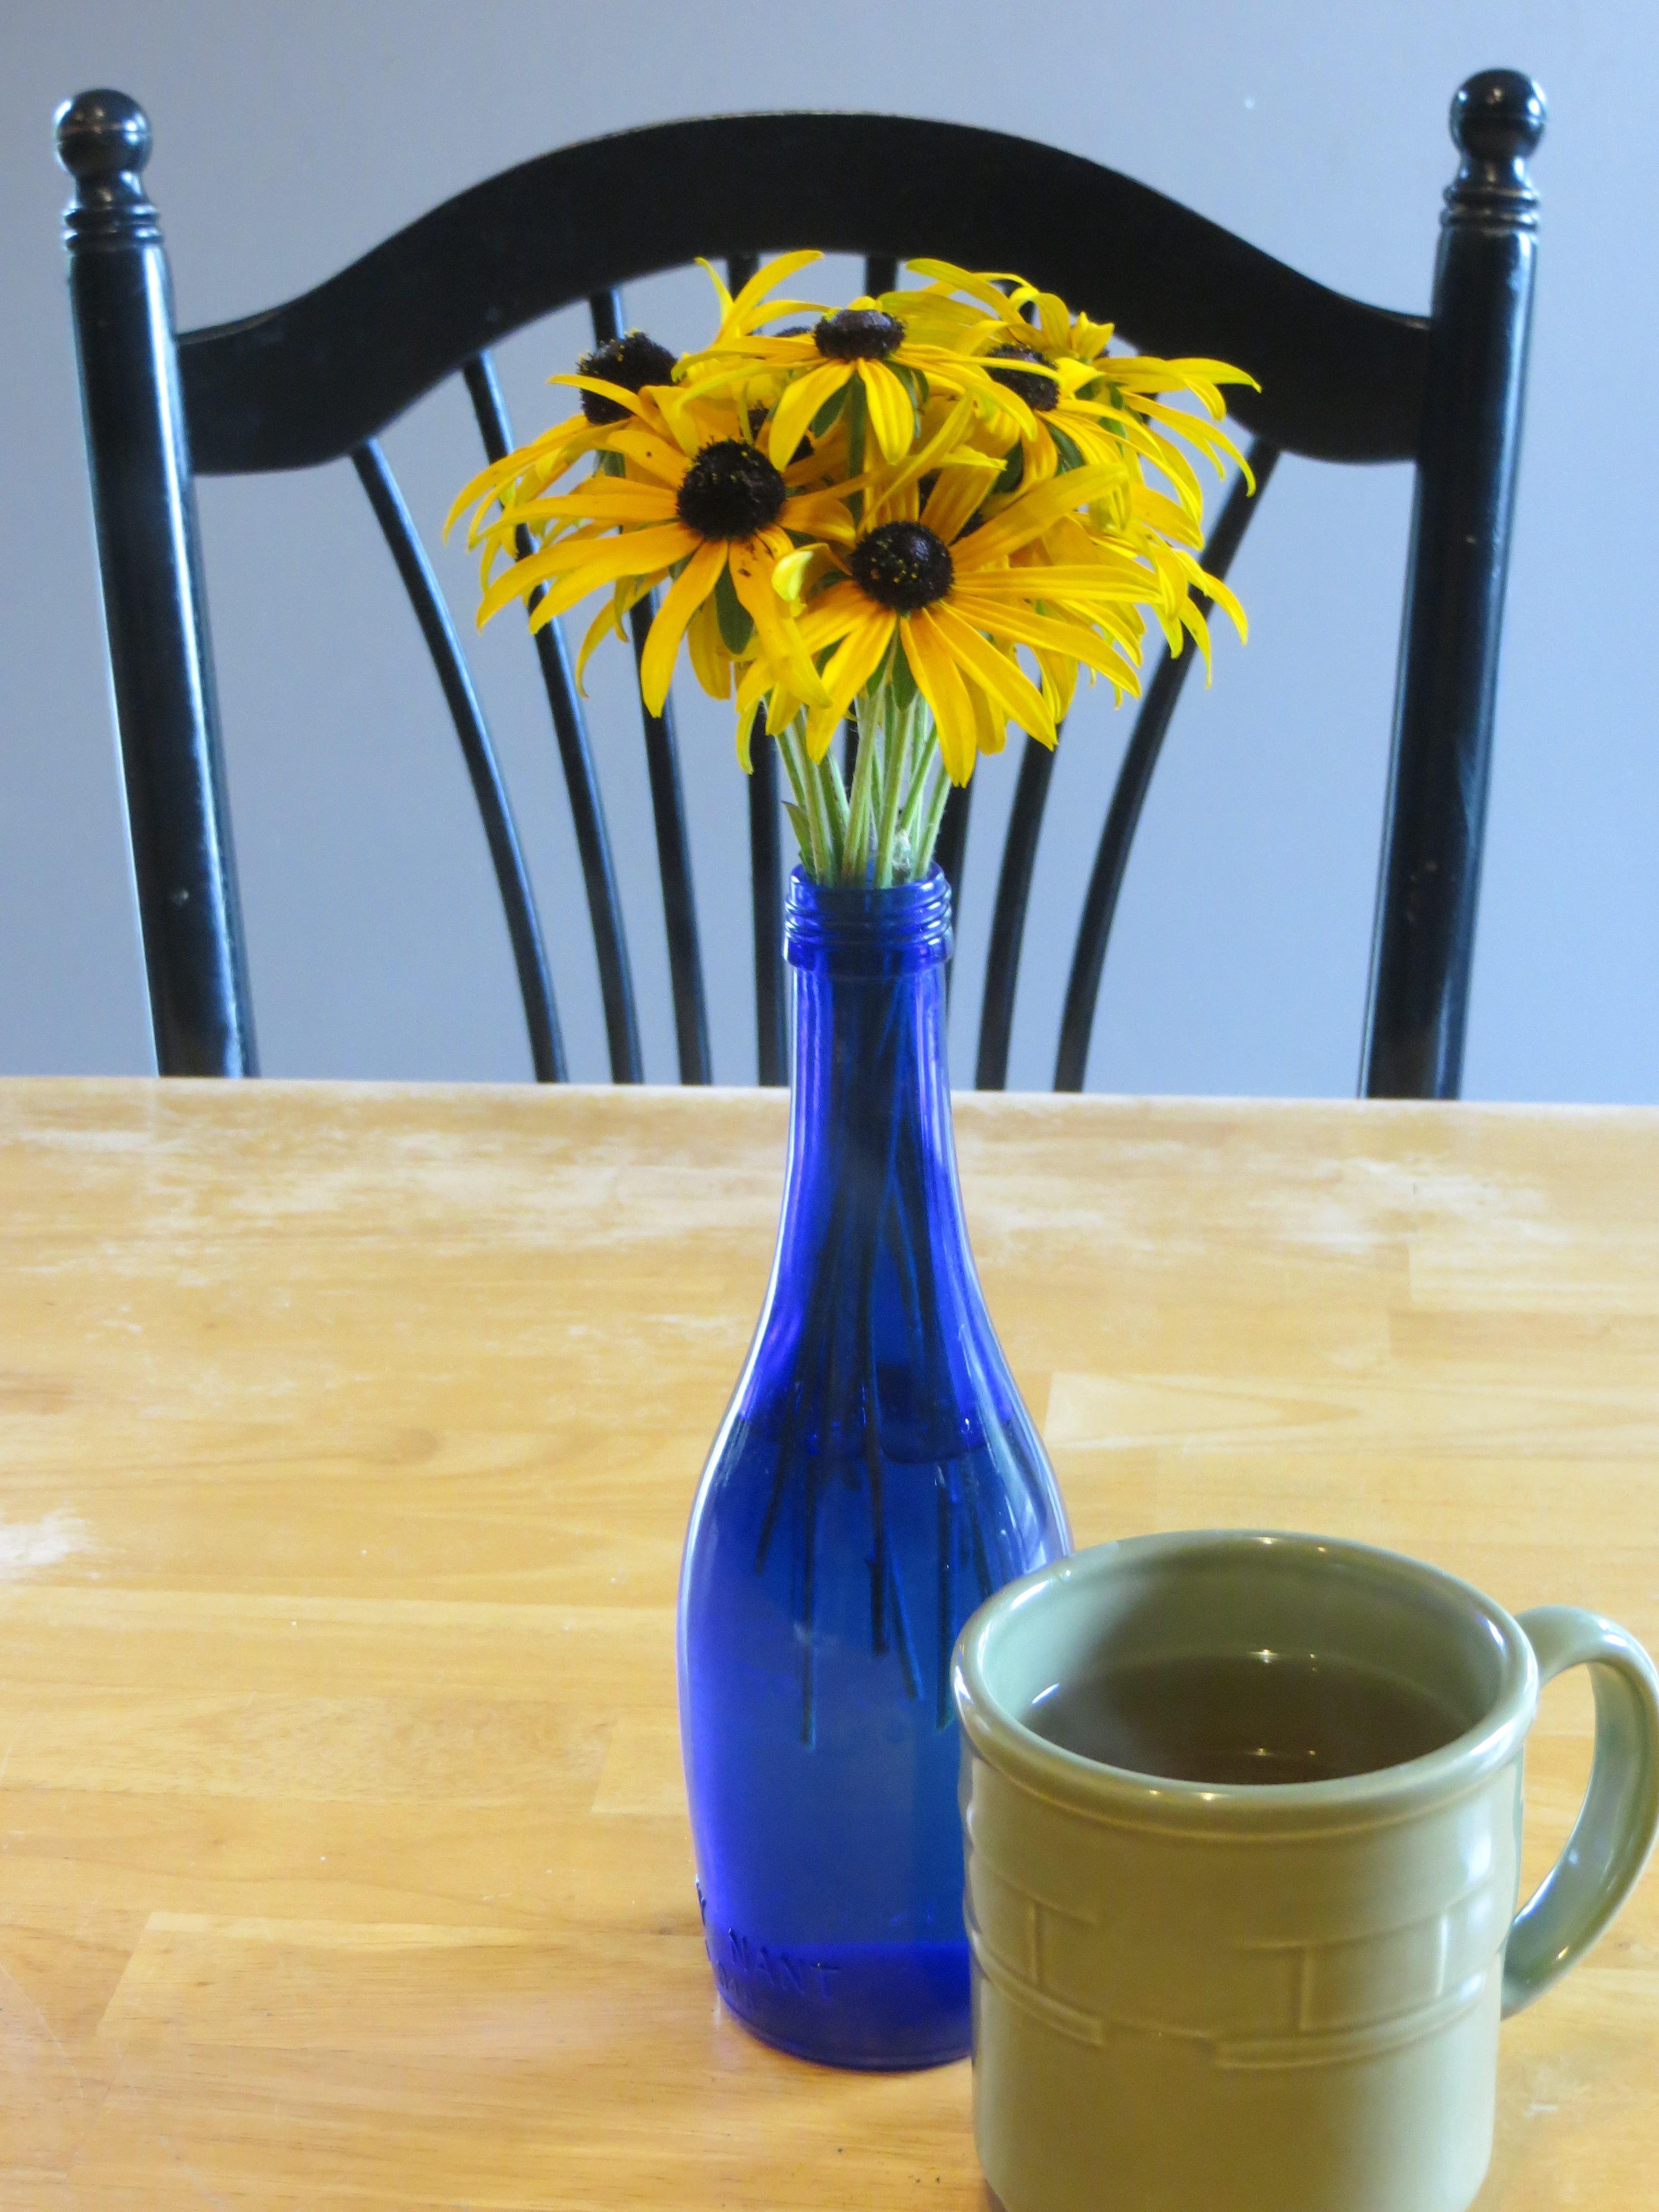 Tuesday Challenge – Enjoy some green tea!